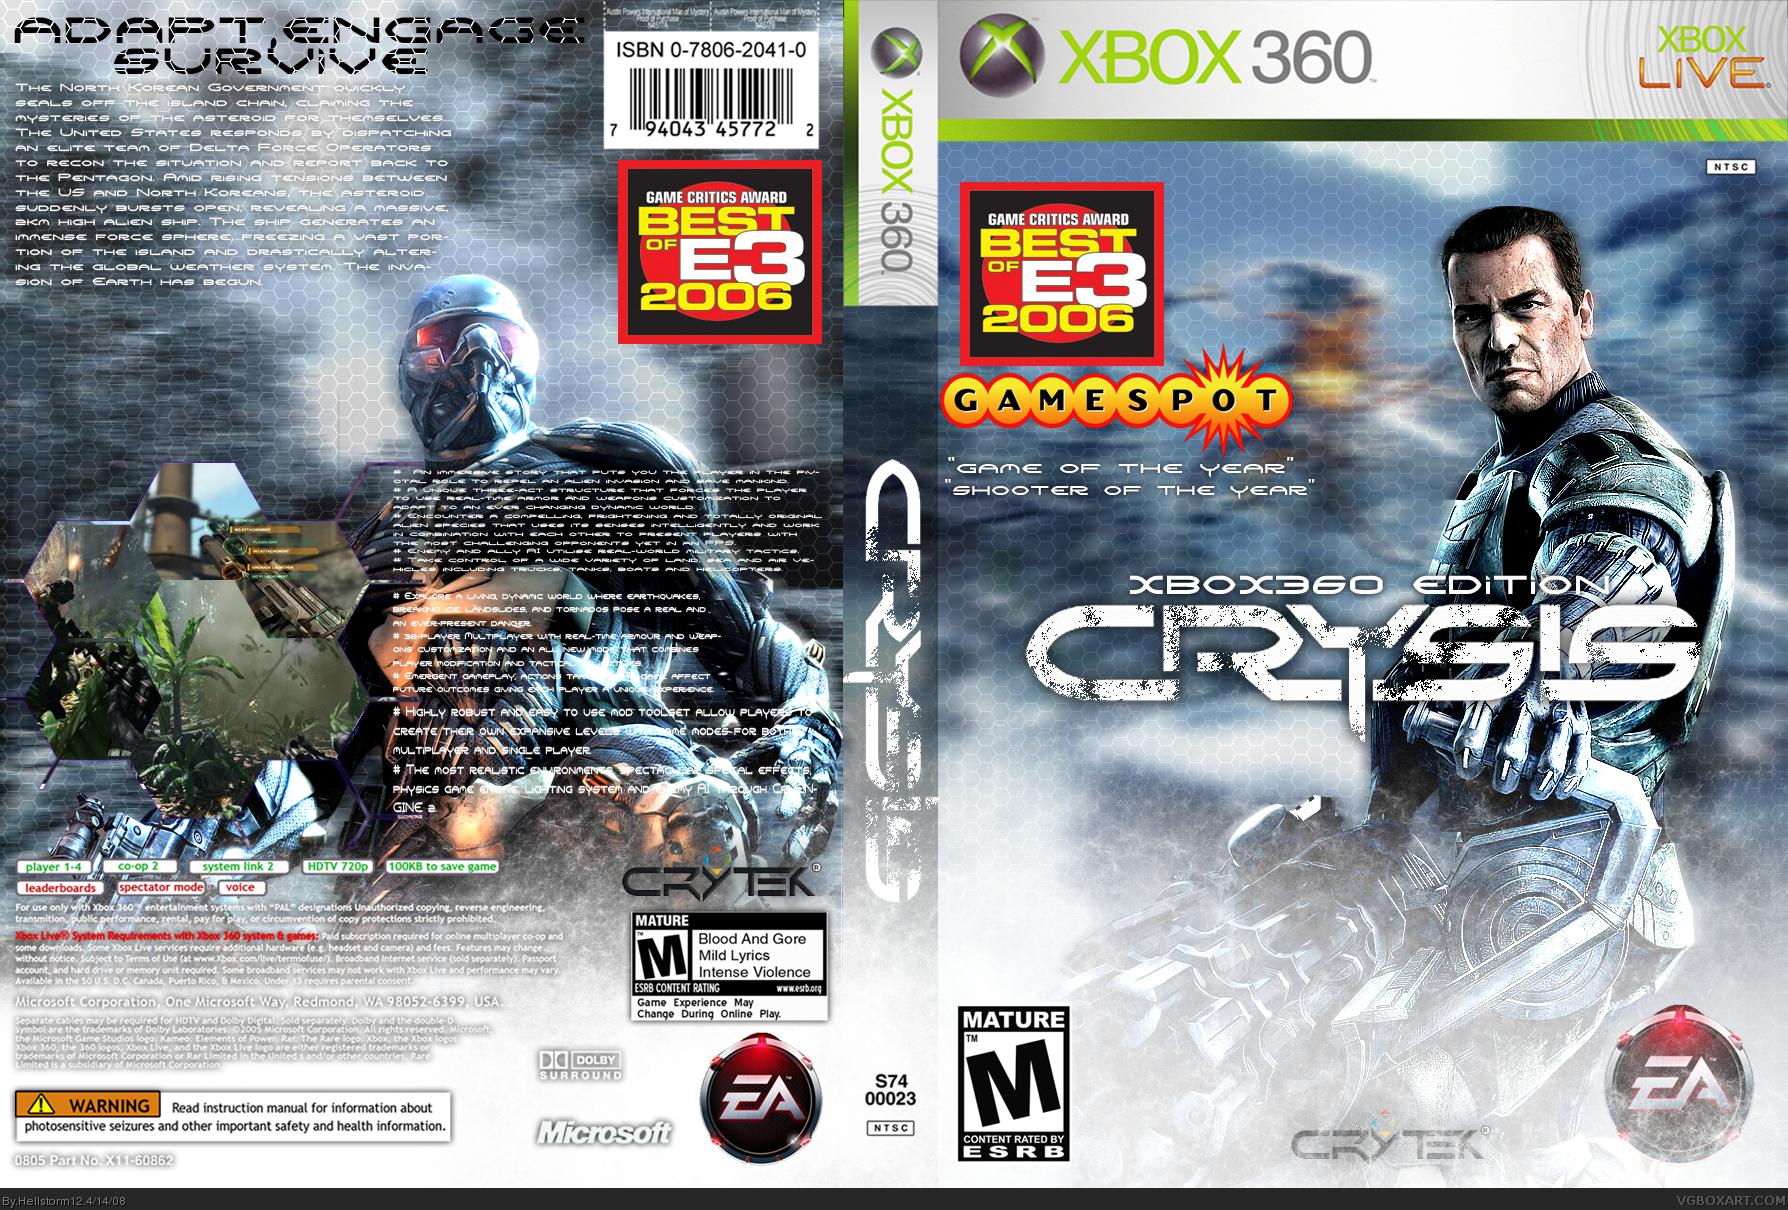 Crysis on xbox 360 : California grill disney orlando on xbox 360 android, xbox 360 wallpapers, xbox 360 facebook, xbox 360 juegos, xbox 360 windows, xbox 360 internet, xbox 360 google, xbox 360 mmorpg, xbox 360 racing games, xbox 360 series, xbox 360 gam, xbox 360 pc, xbox 360 gry, xbox 360 hardware, xbox 360 software, xbox 360 home, xbox 360 online, xbox 360 gow, xbox 360 brasil, xbox 360 spiele,